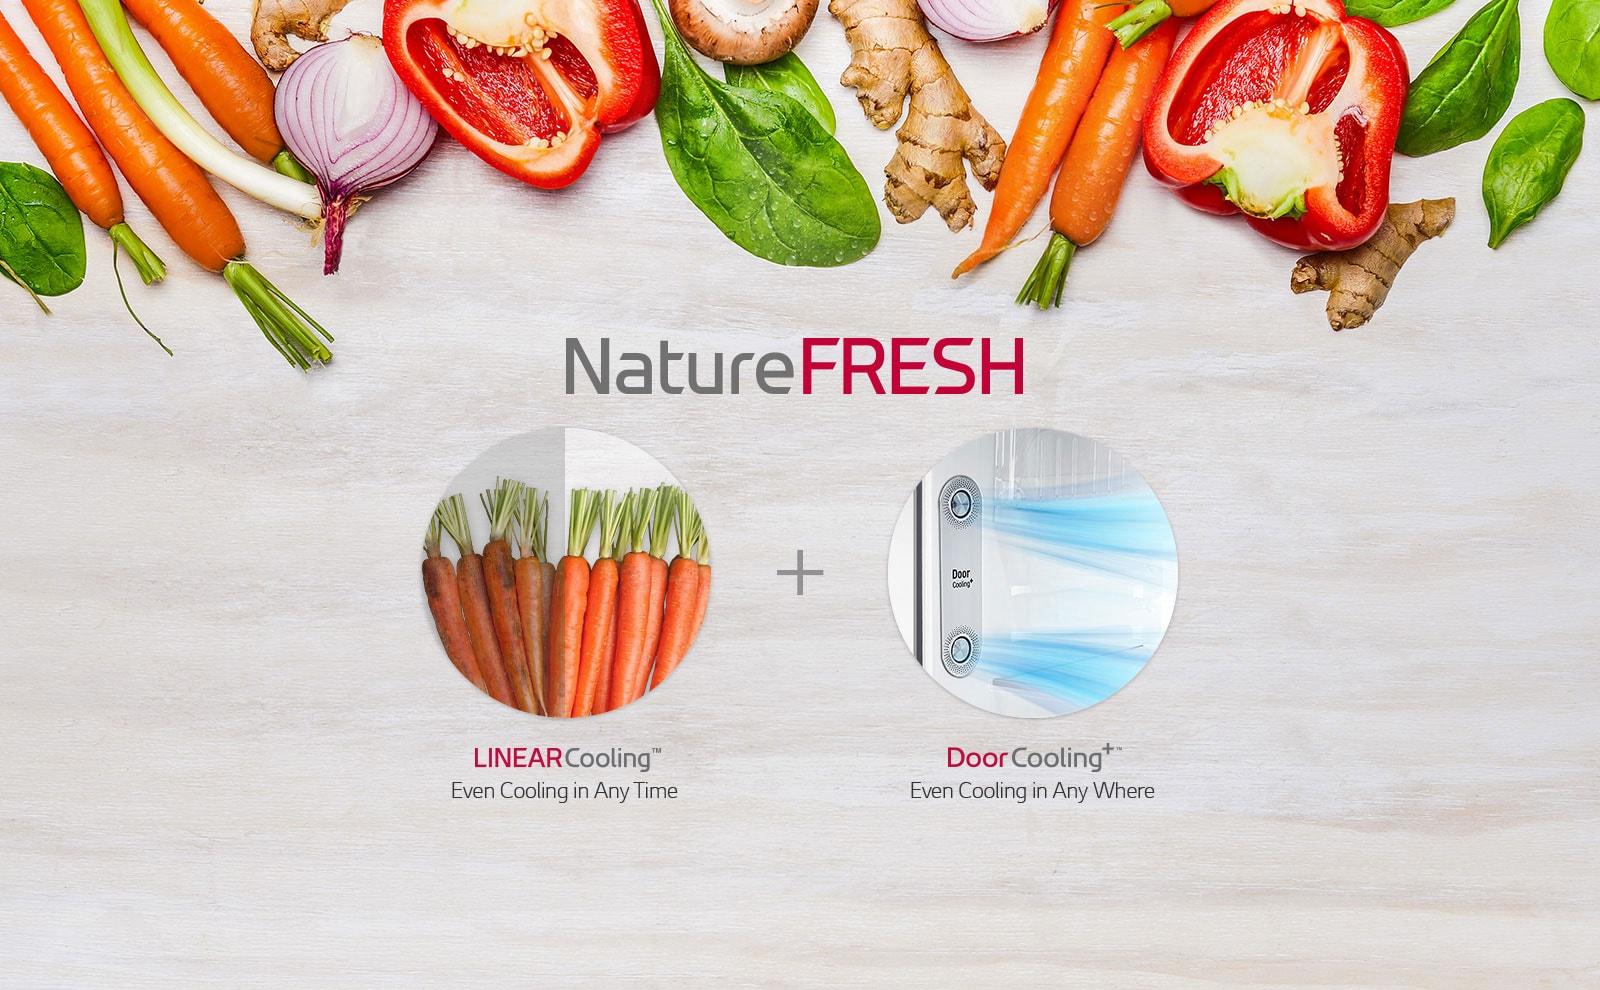 Refrigerators-NatureFRESH_Desktop